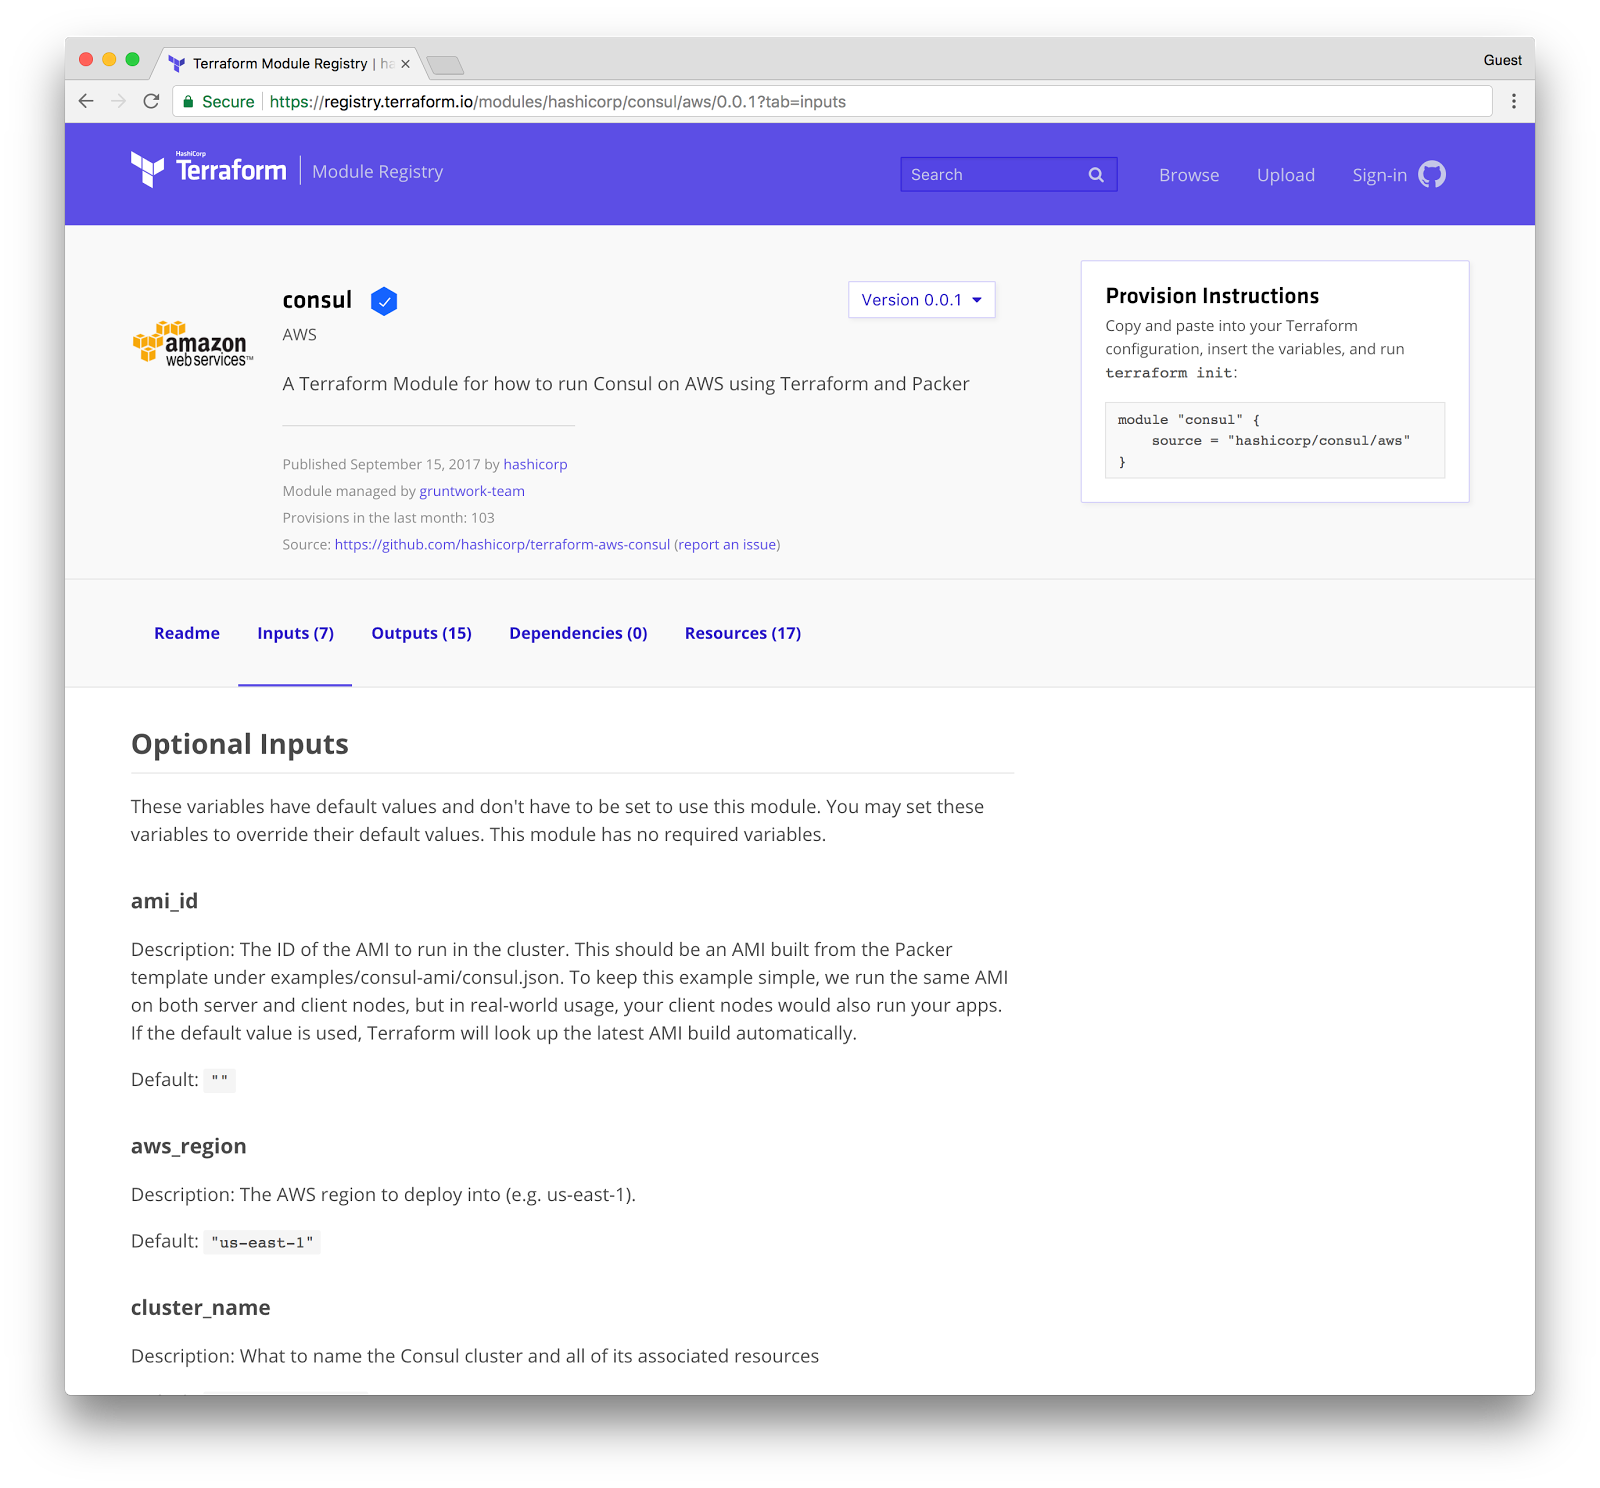 HashiCorp's Terraform Module Registry Provides Self-Service Modules